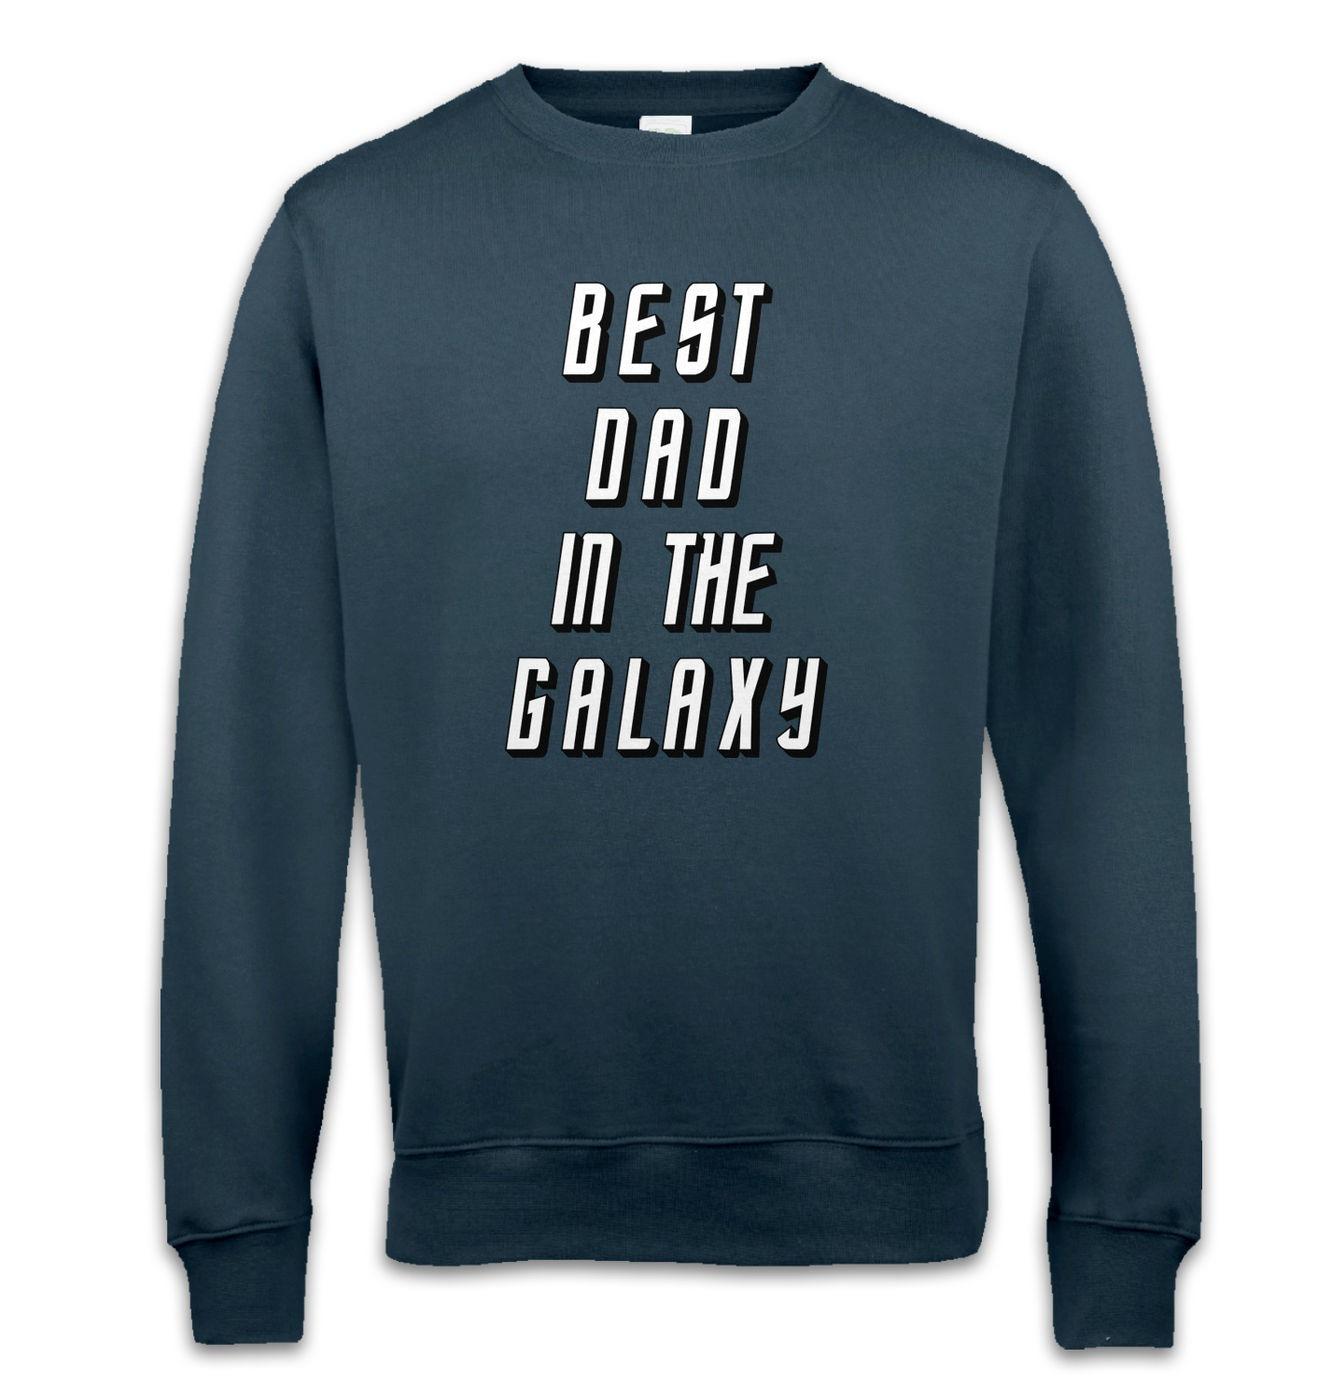 Best Dad In The Galaxy crewneck sweatshirt